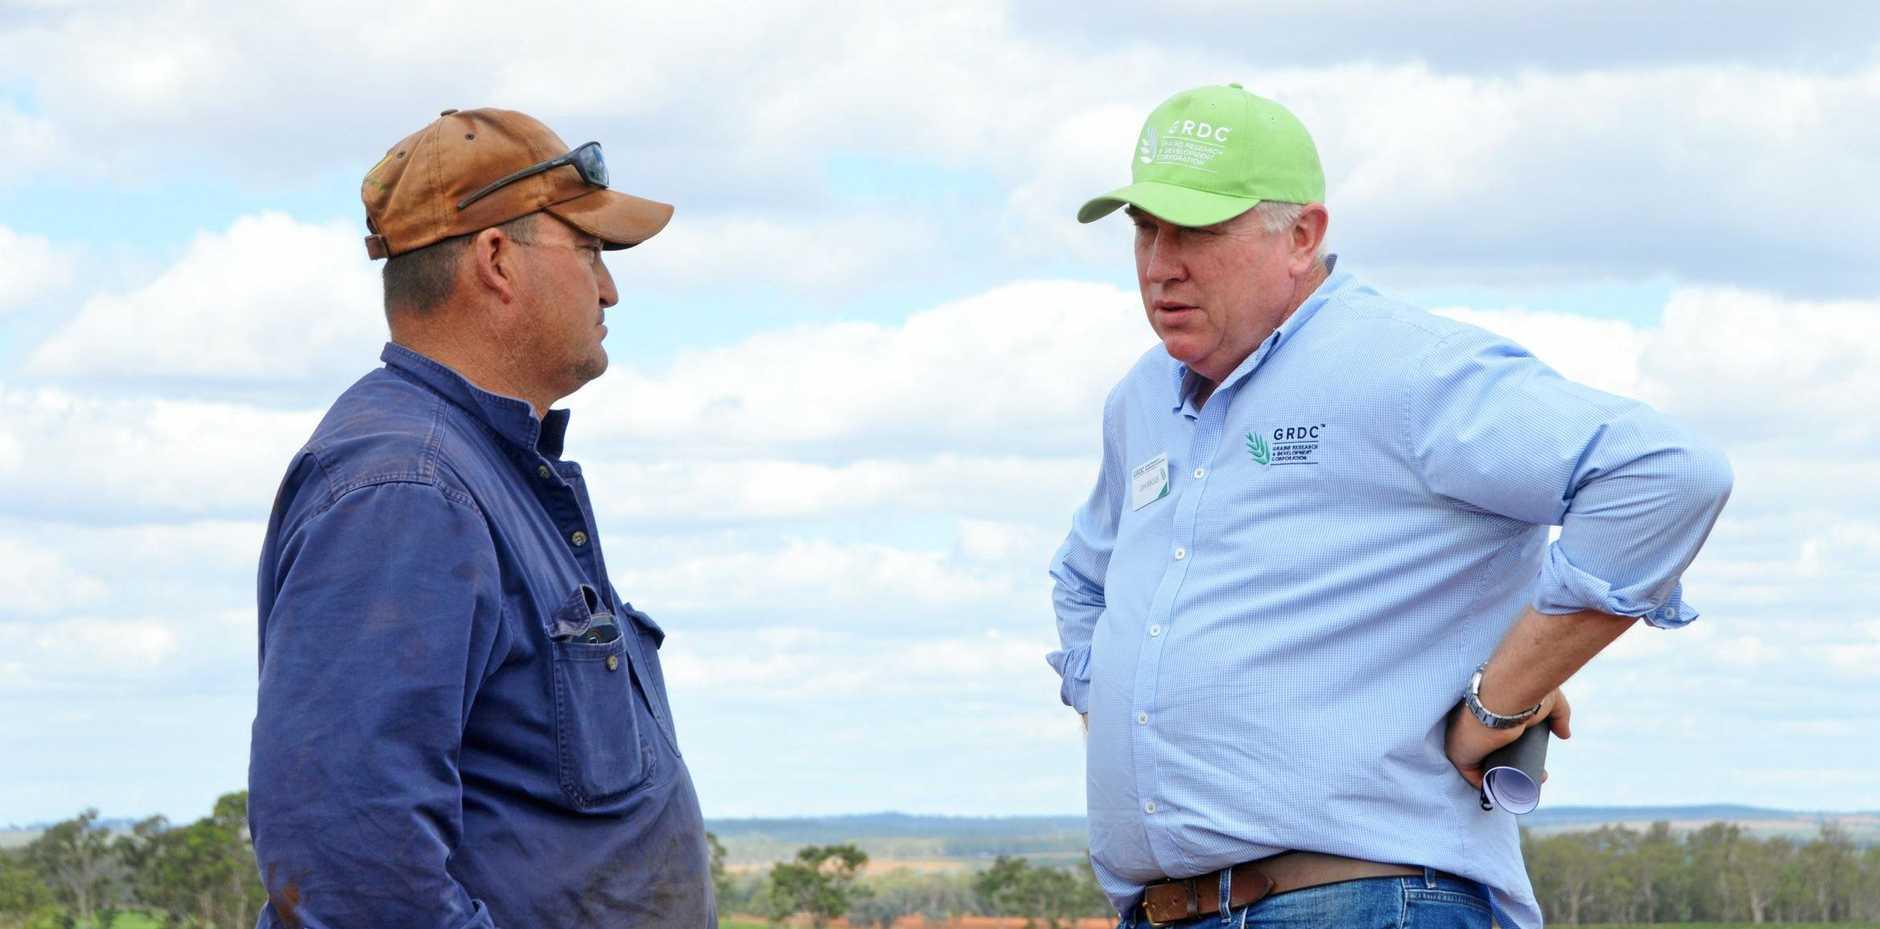 TALKING TRIALS: Farmer Peter Howlett on his farm with GRDC Northern Panel chairman John Minogue.